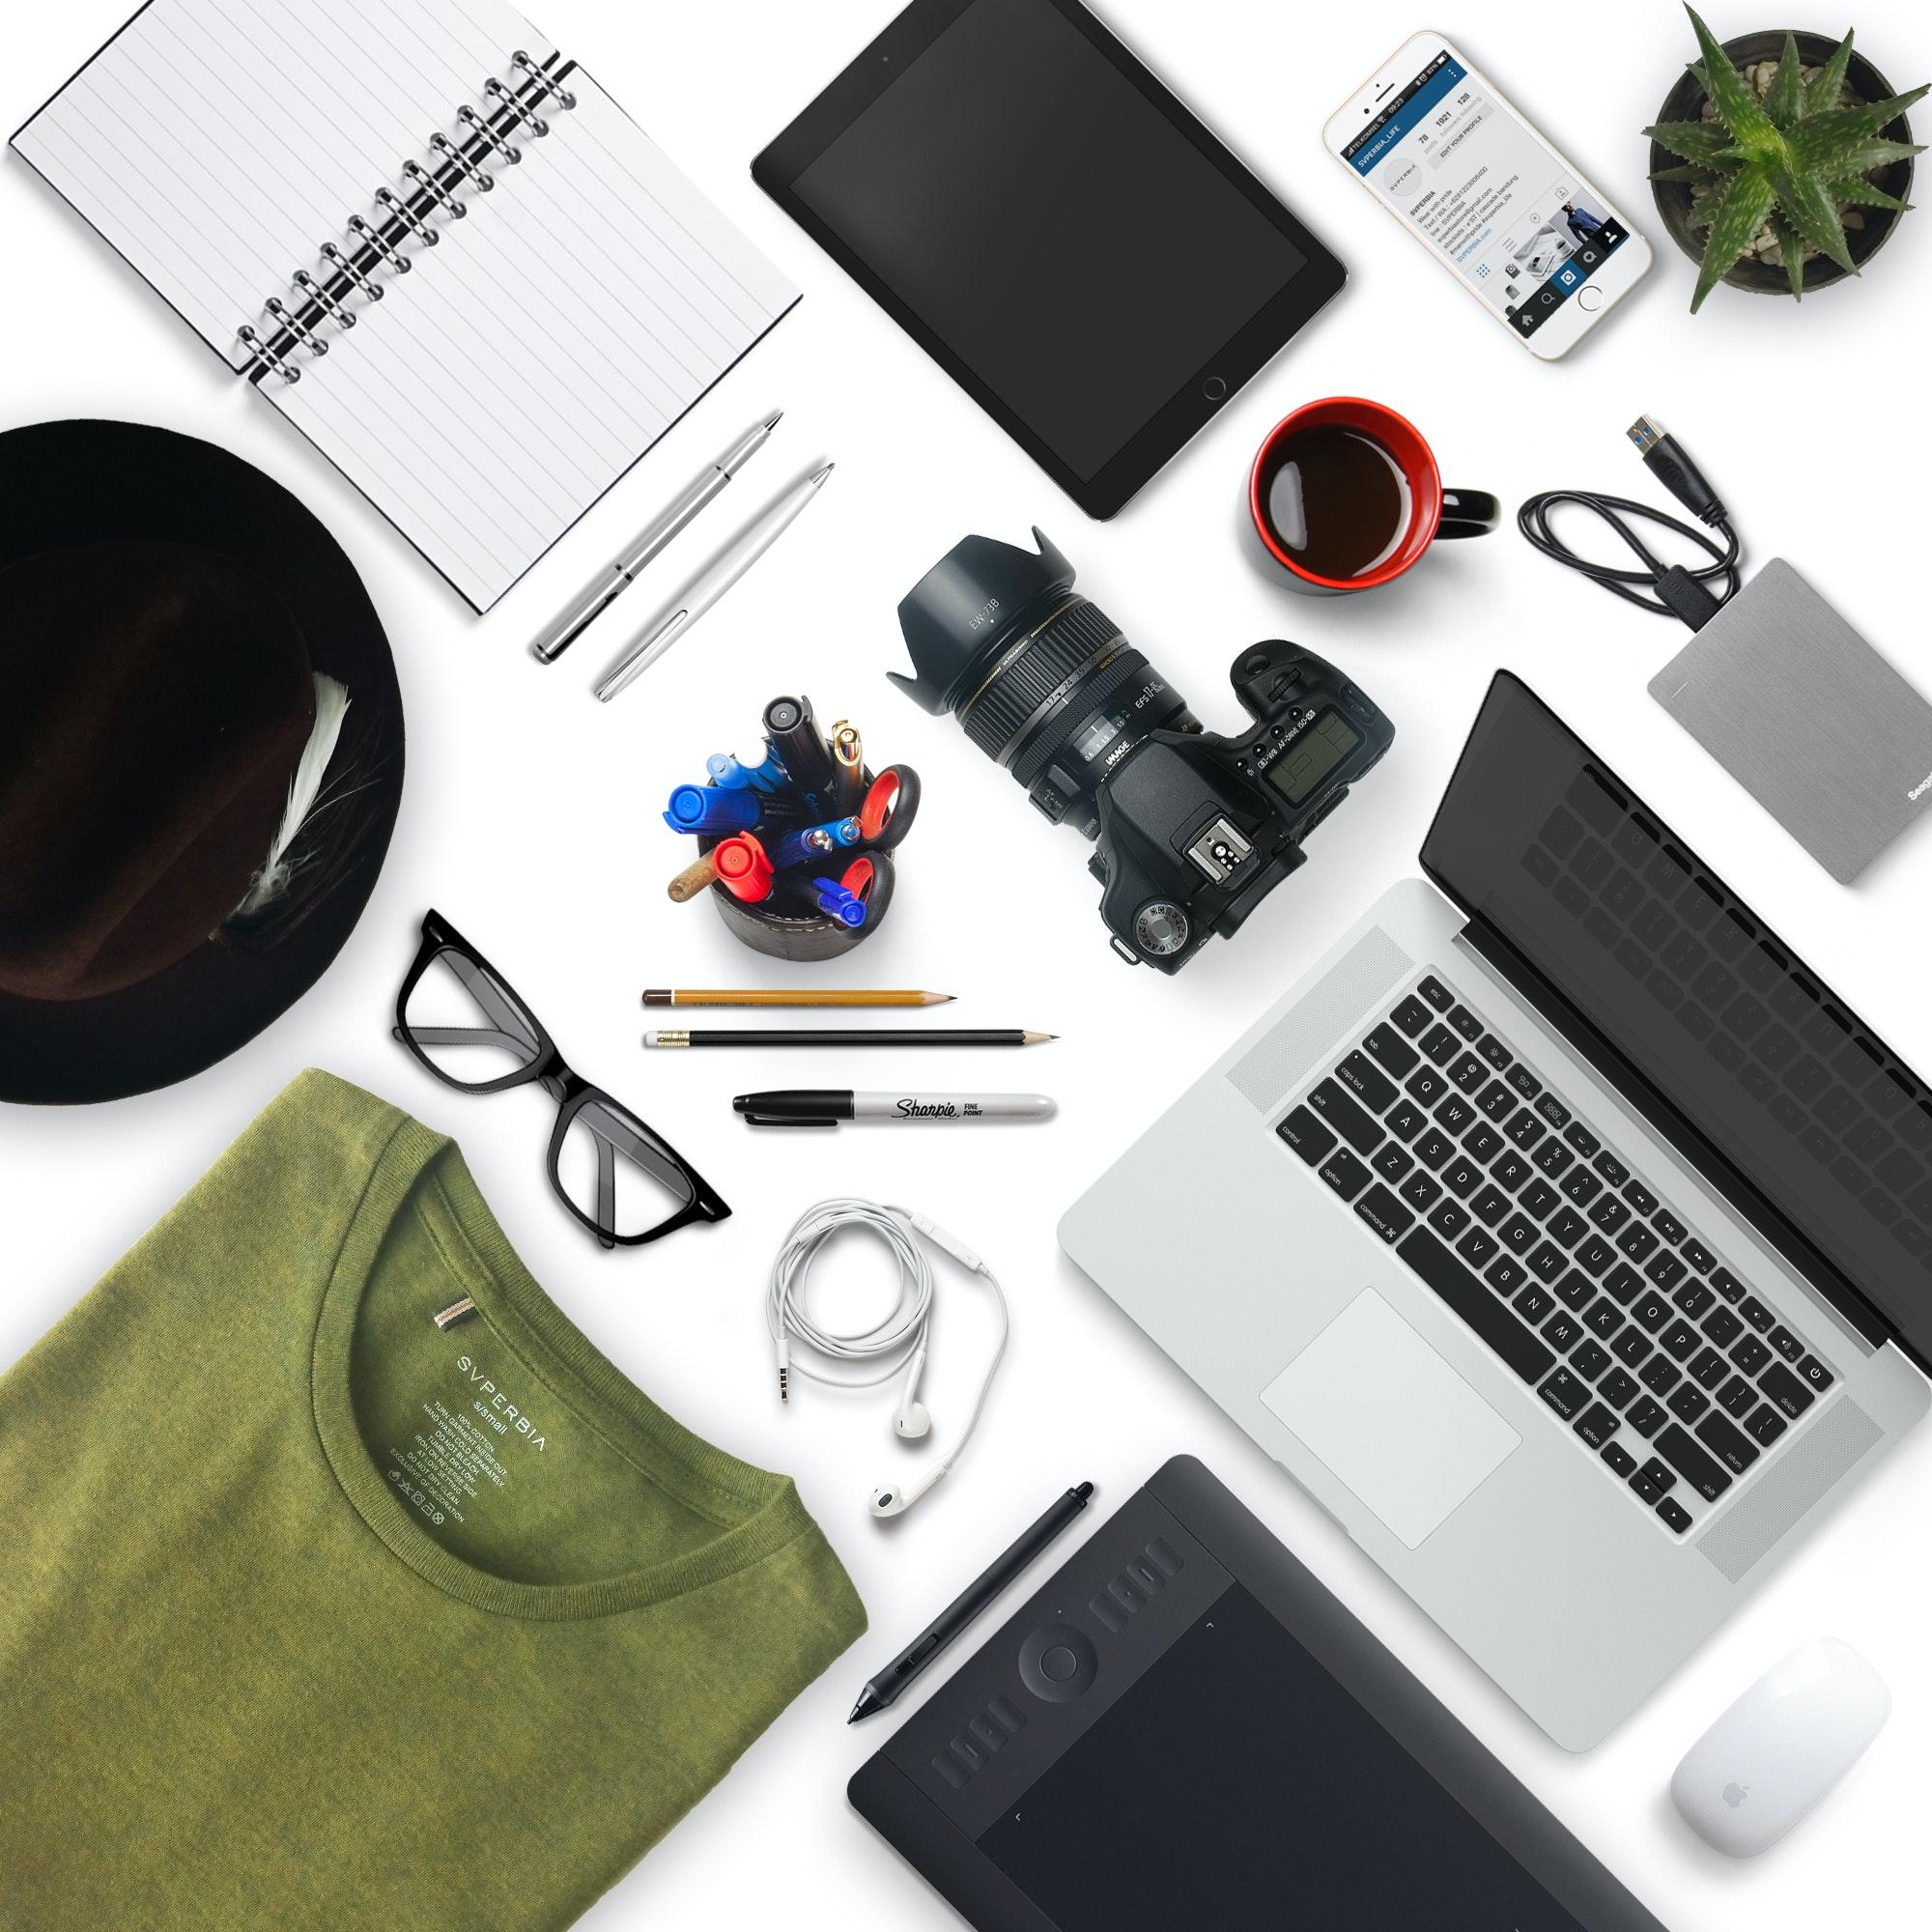 How to make money as a photography - Beazy Webinar